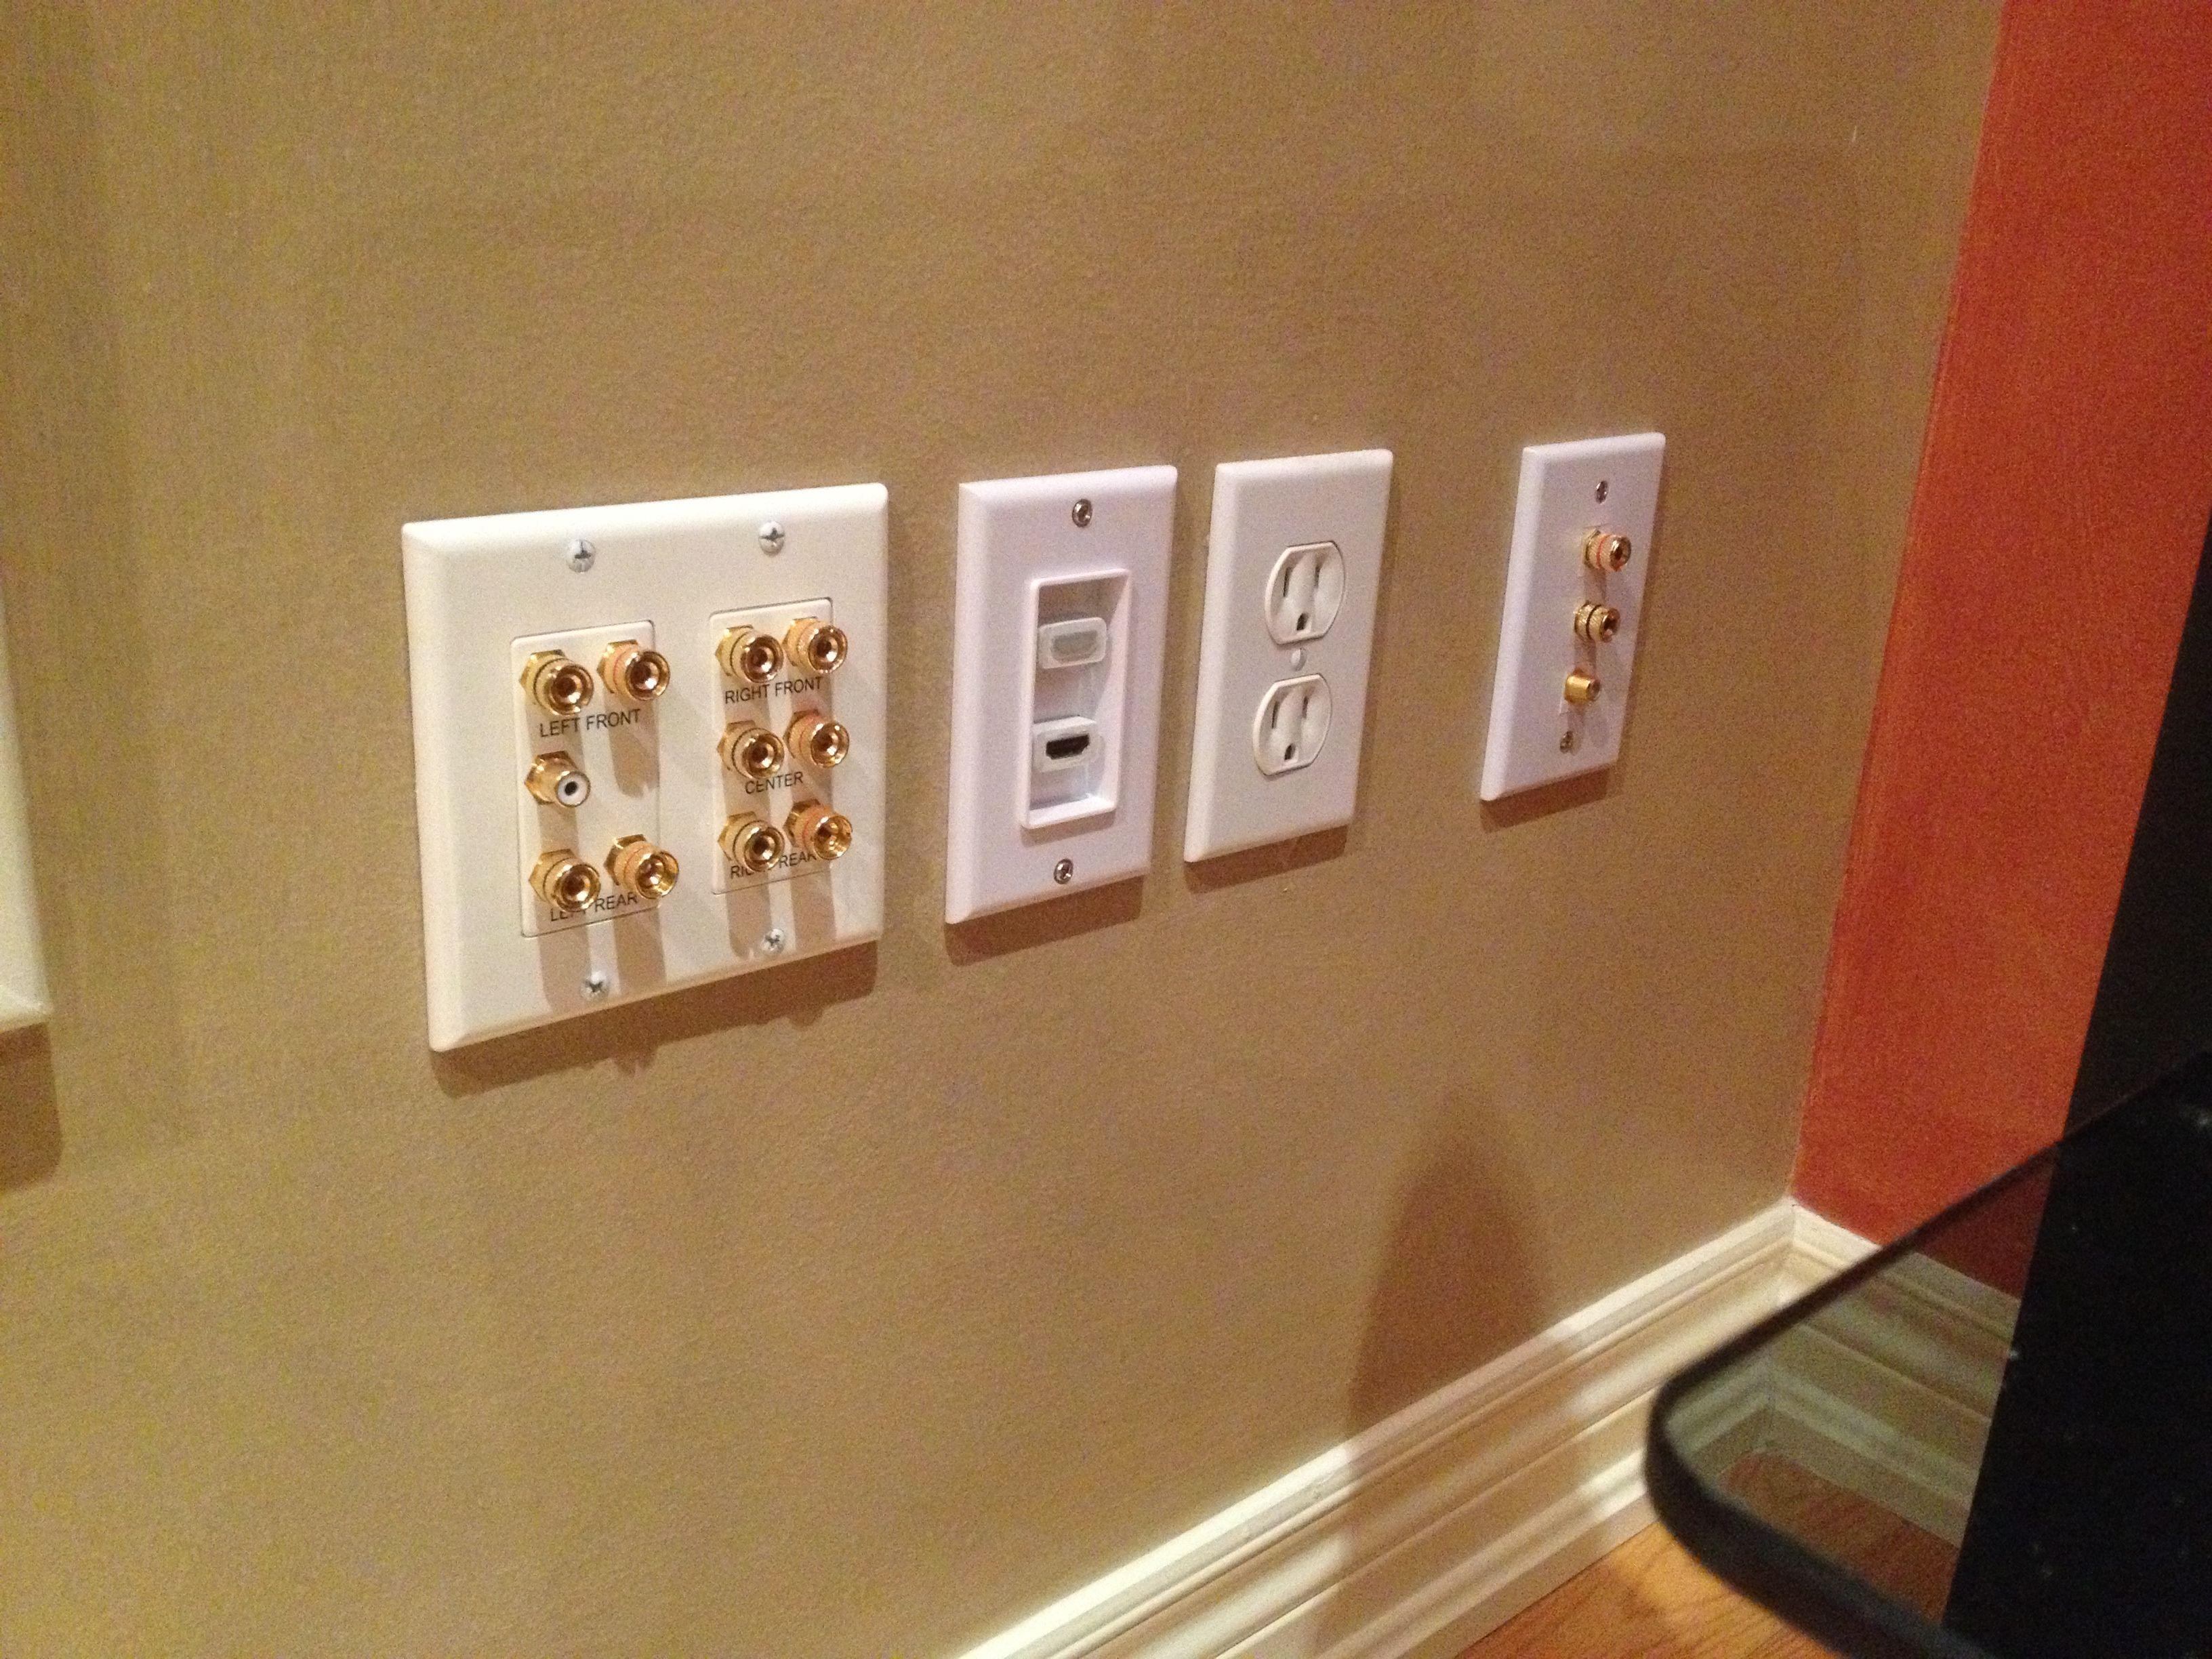 5 1ch Sound Distribution Banana Plug Wall Plate 2 Port Hdmi Wall Plate 2 Post Banana Plug Keysto Plates On Wall Home Theater Installation Home Theater Setup